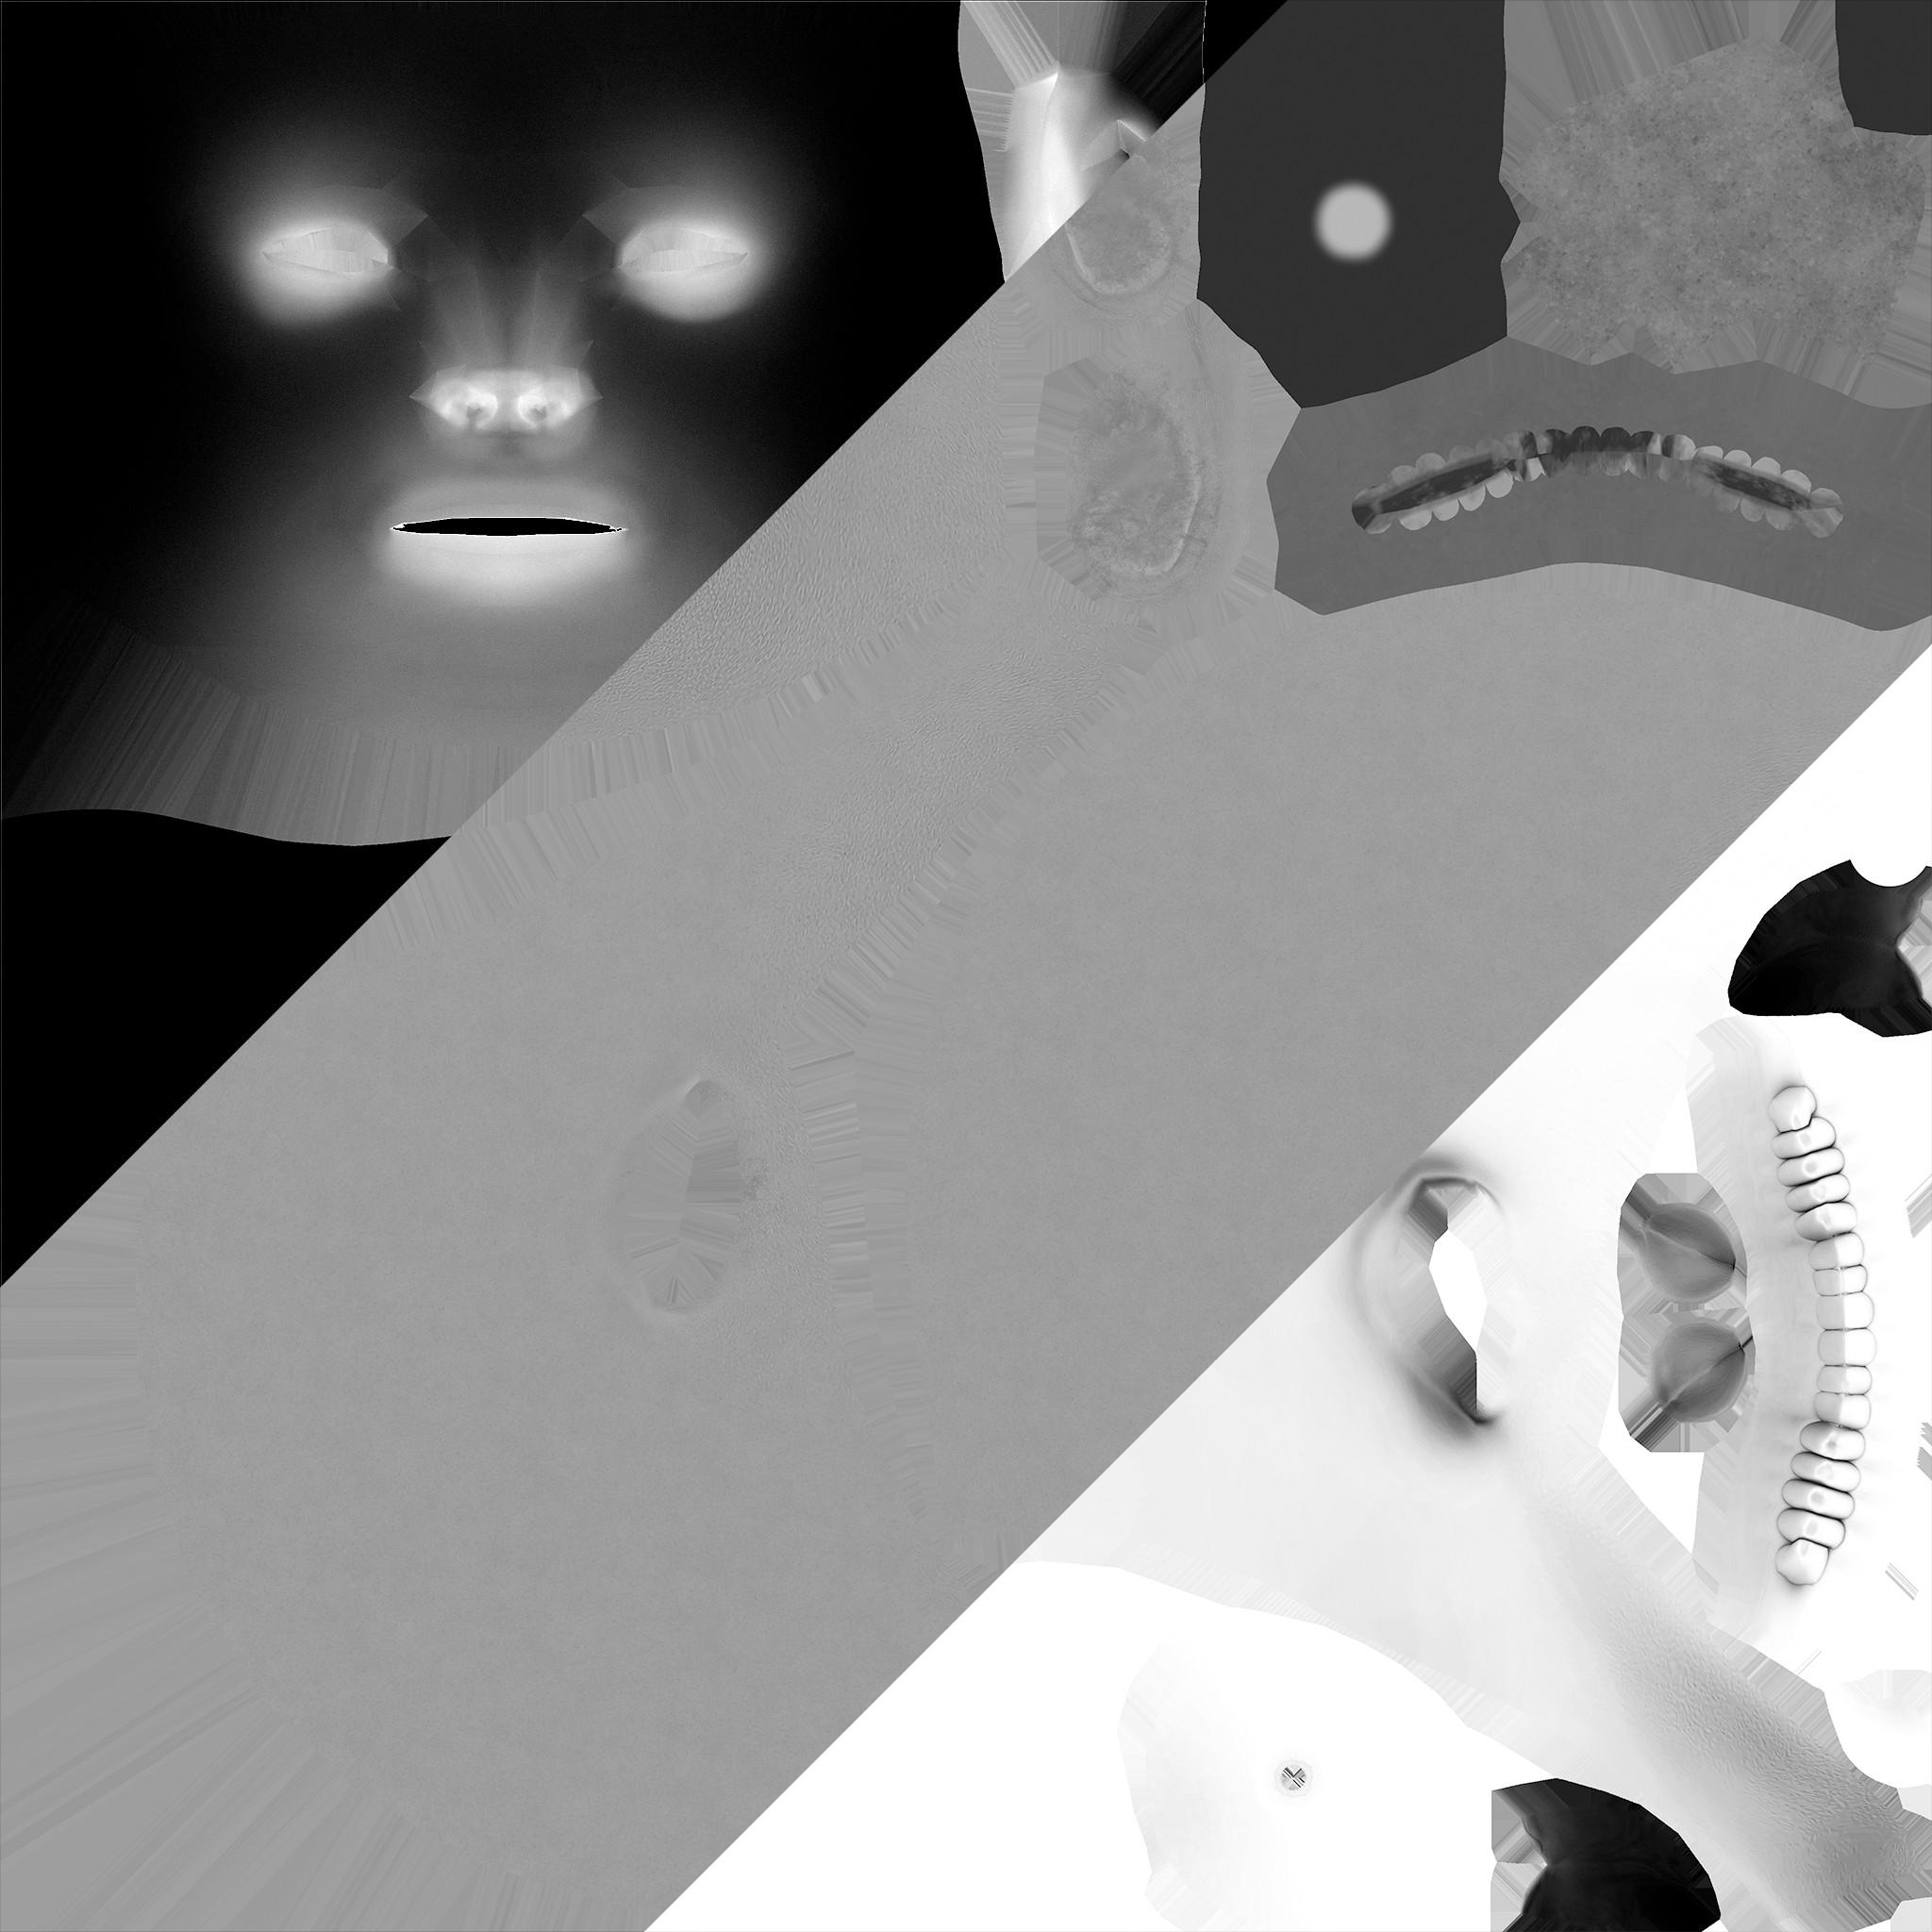 Face's SS/Roughness/AO maps